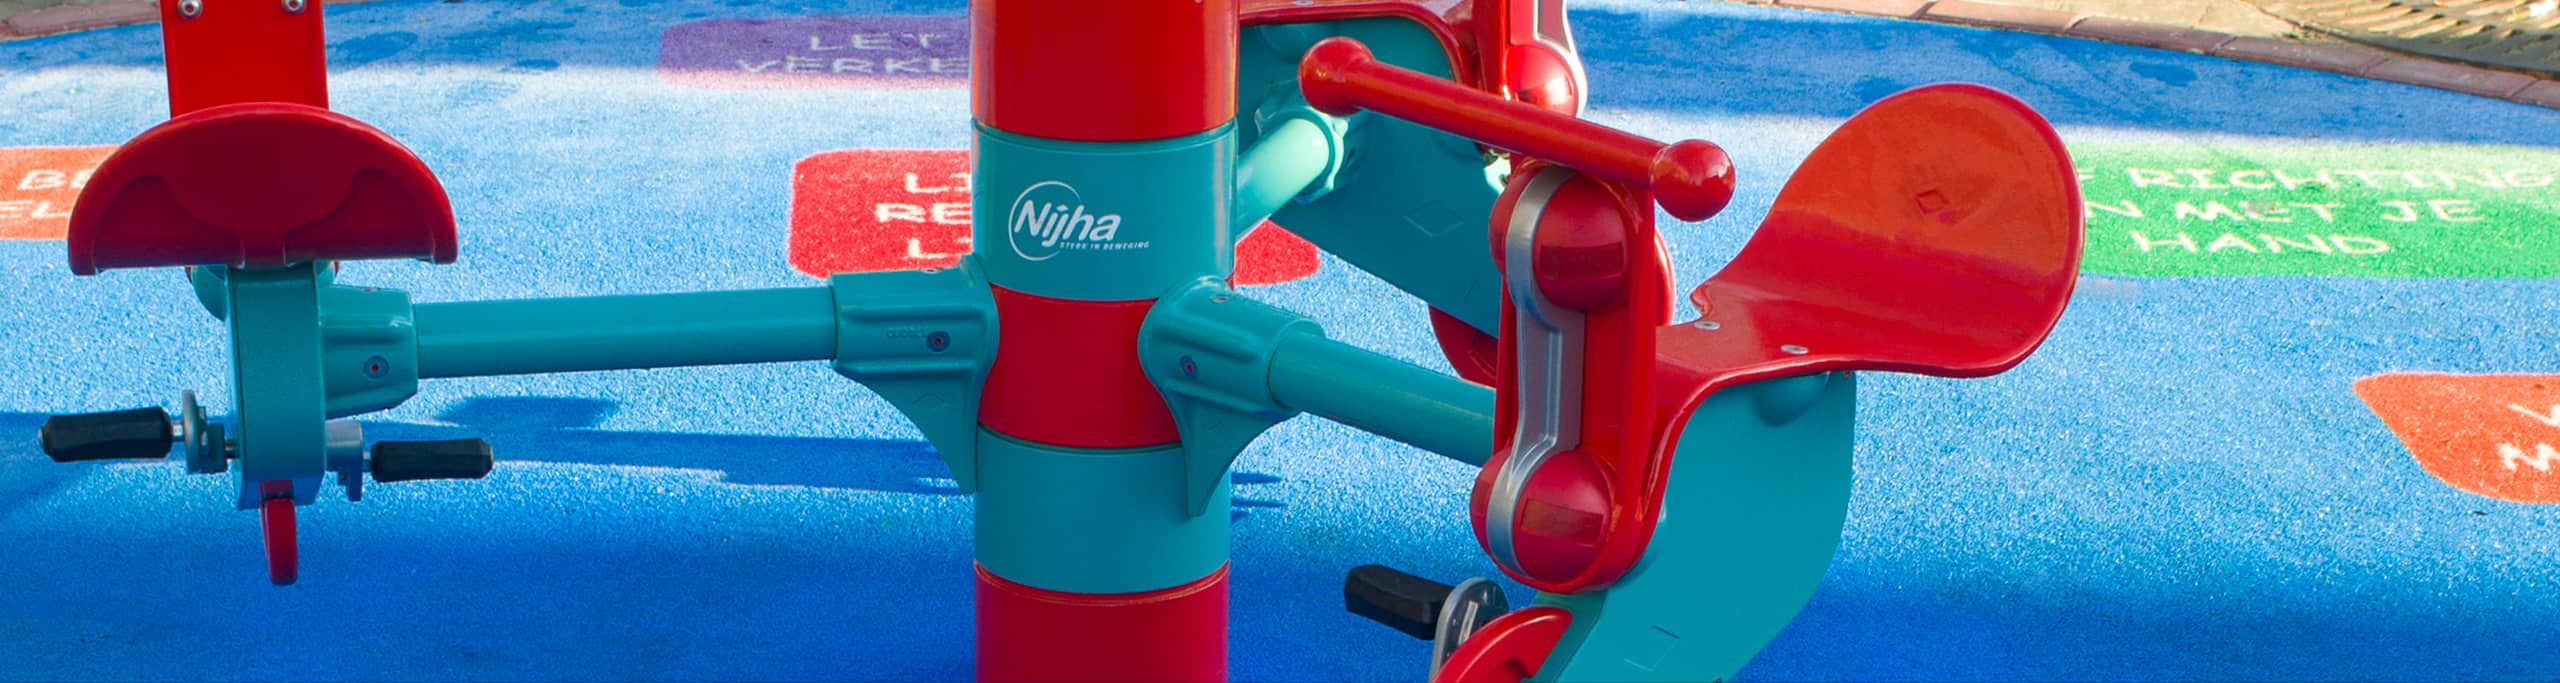 Nijha playground equipment Hanno Groen Design Amsterdam